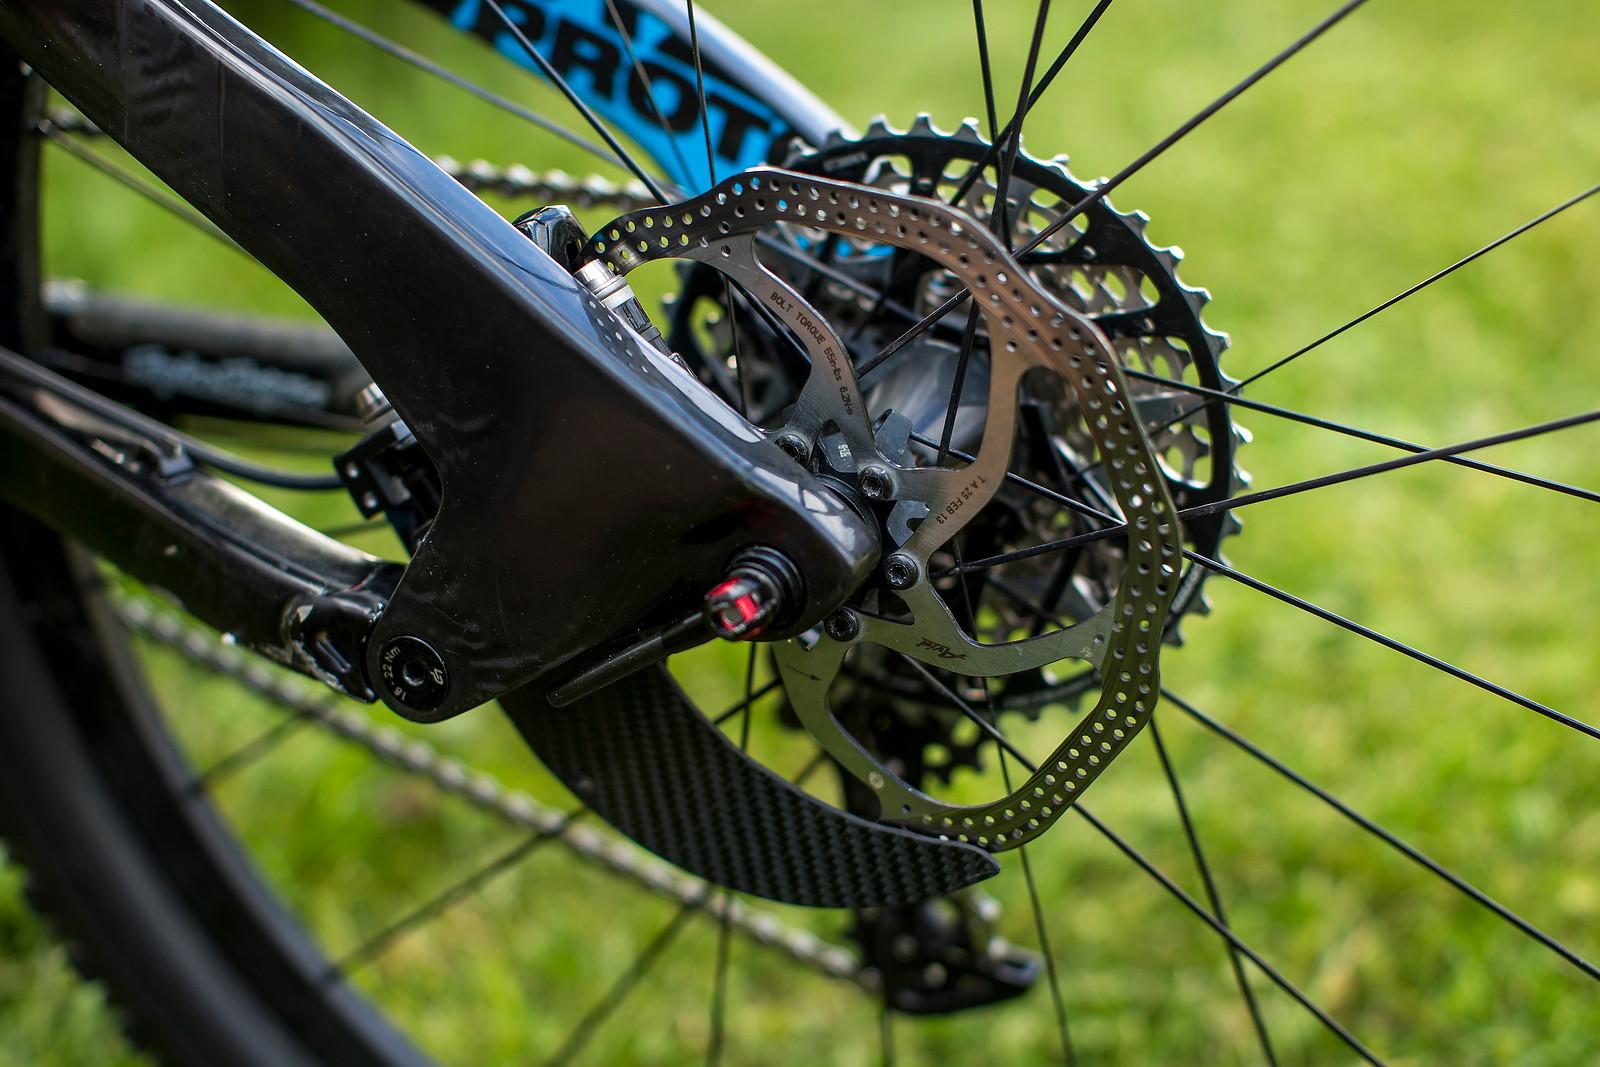 PIT BITS Val d'Allos Enduro World Series: Carbon Rotor Guard on Nico Vouilloz's Lapierre - Pit Bits: Enduro World Series Val d'Allos, France - Mountain Biking Pictures - Vital MTB